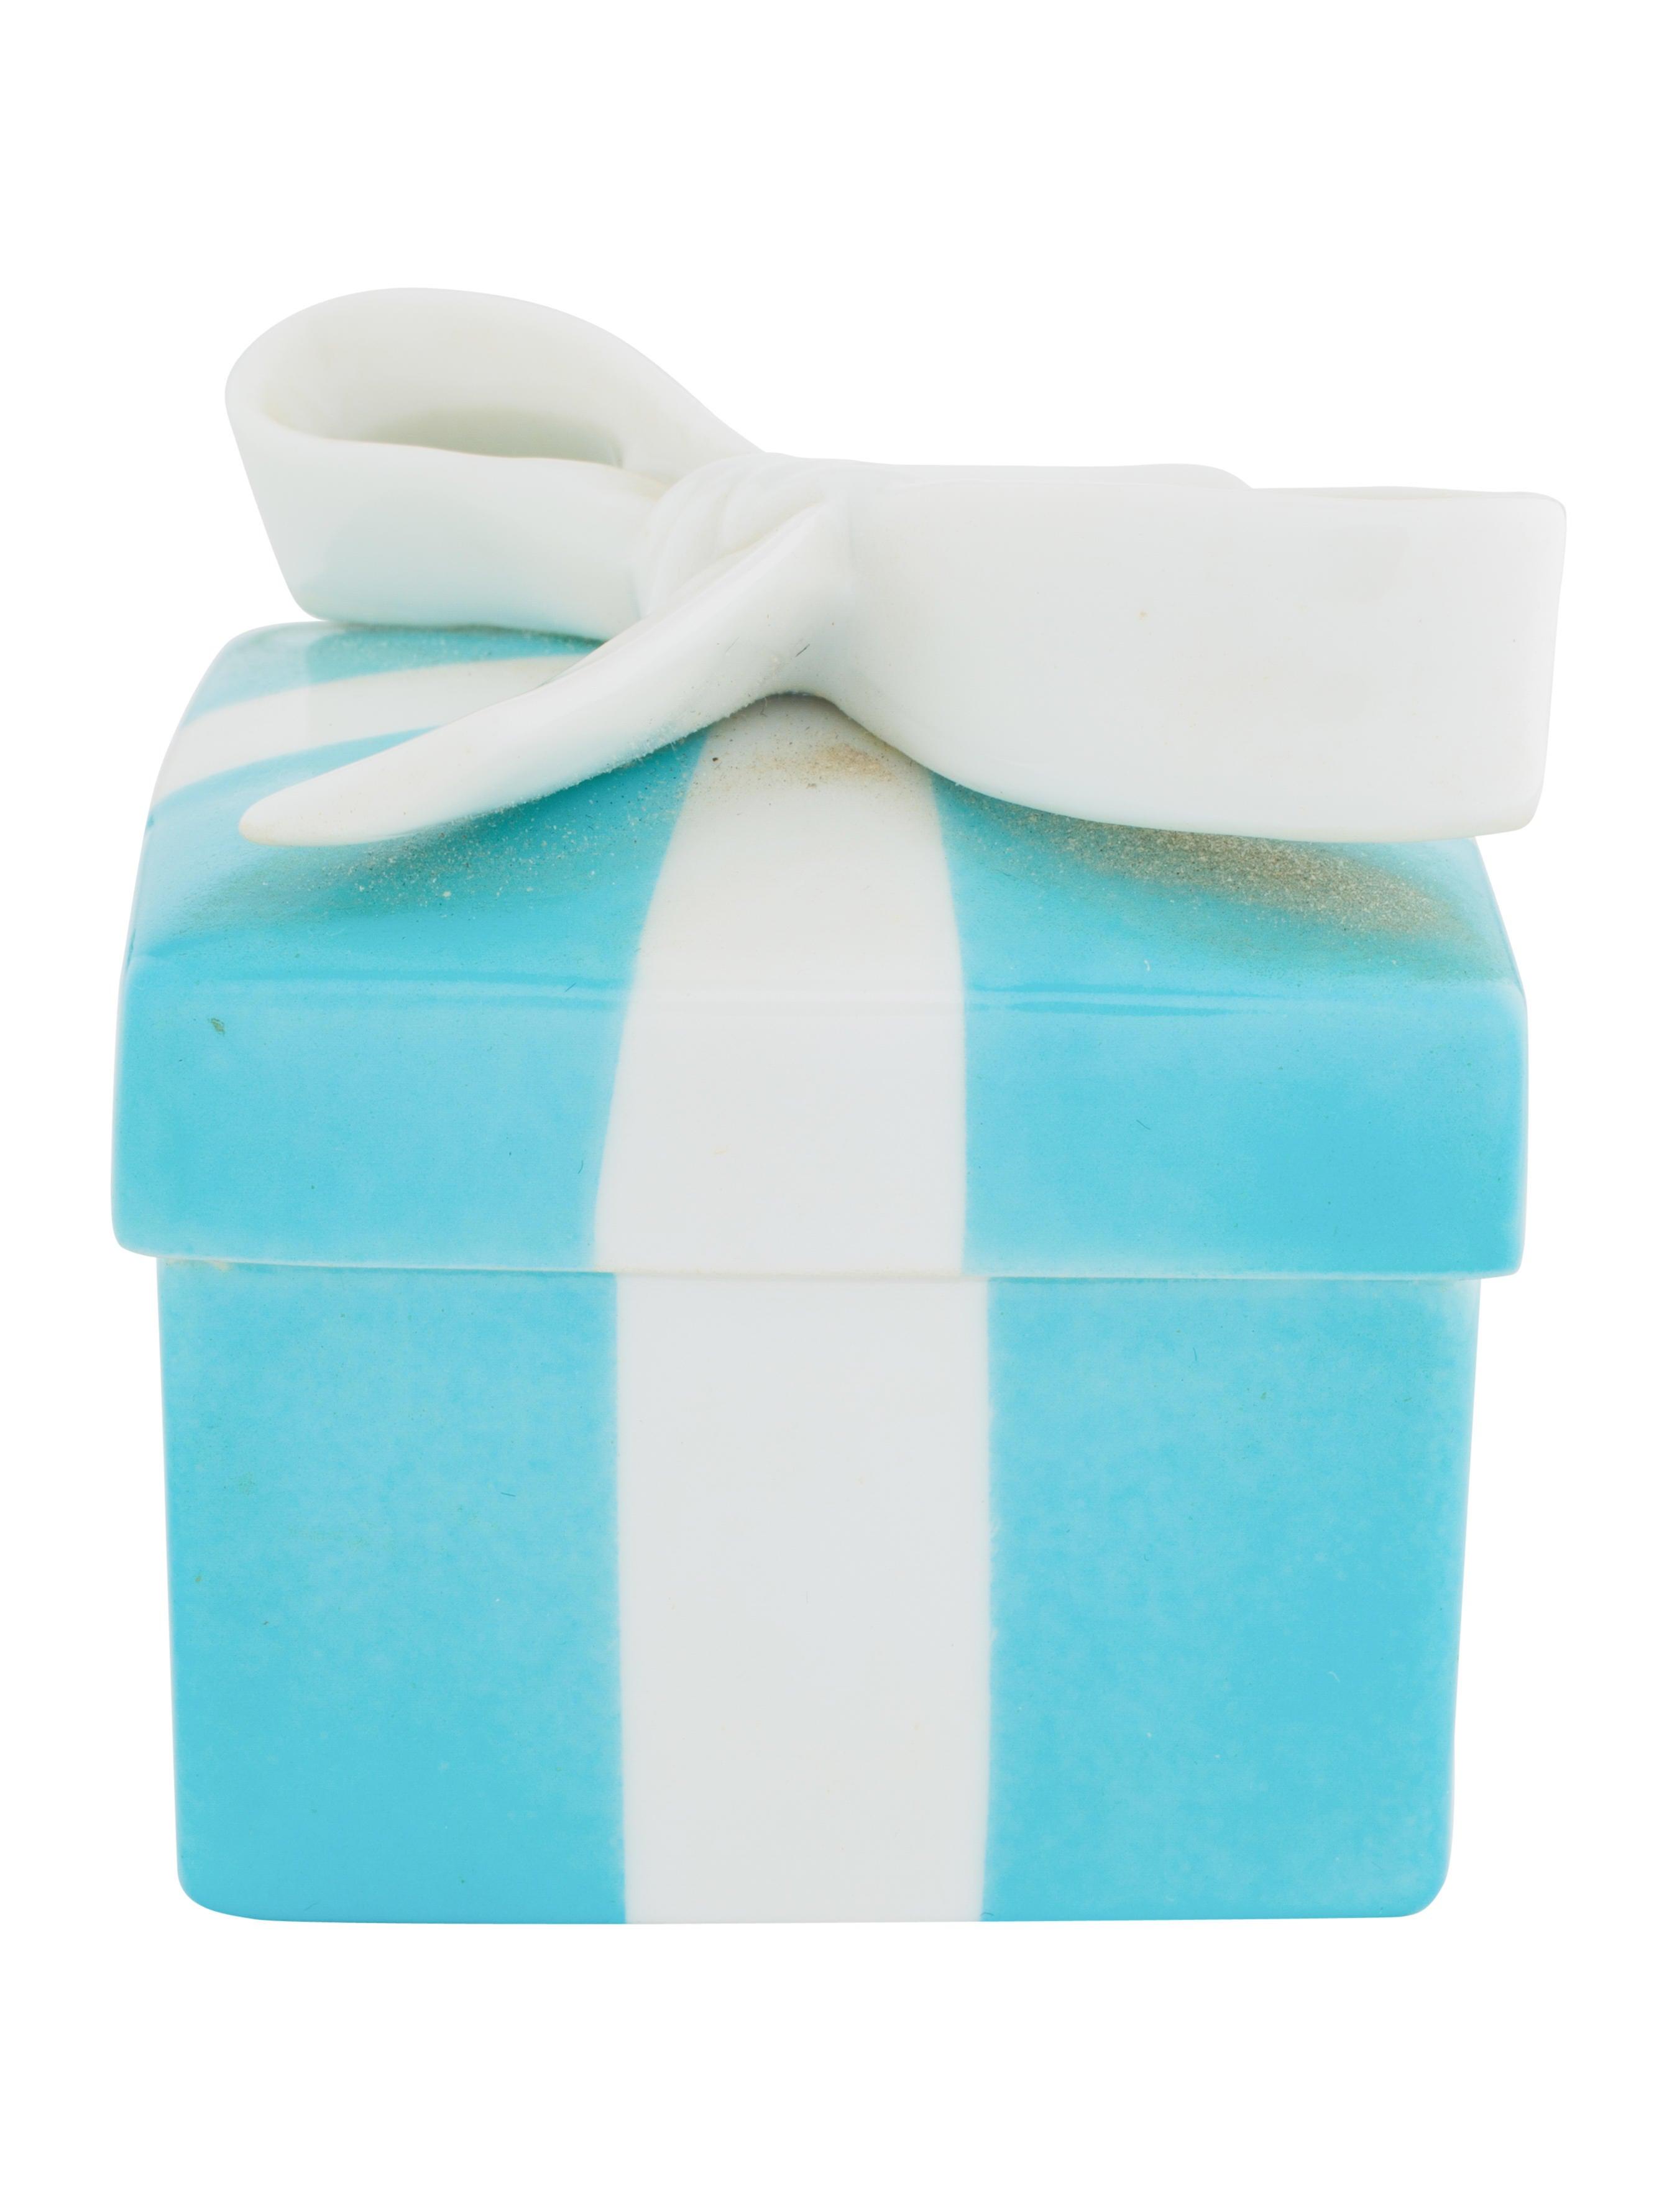 Tiffany & Co. Porcelain Blue Box - Decor And Accessories - TIF66945 ...